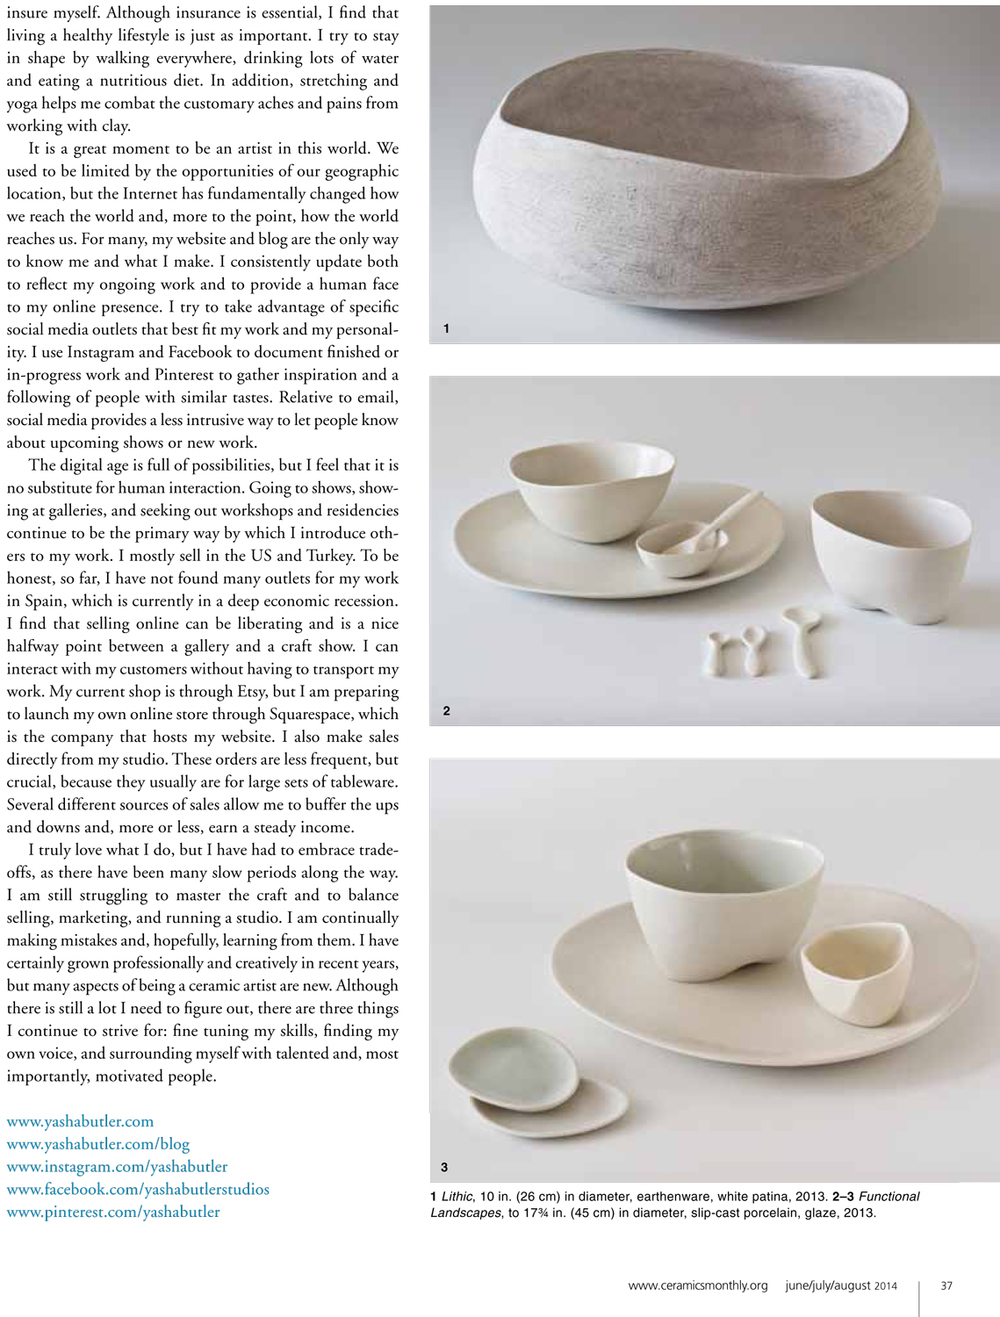 YashaButler_CeramicsMonthly_June2014_2_WEB.jpg